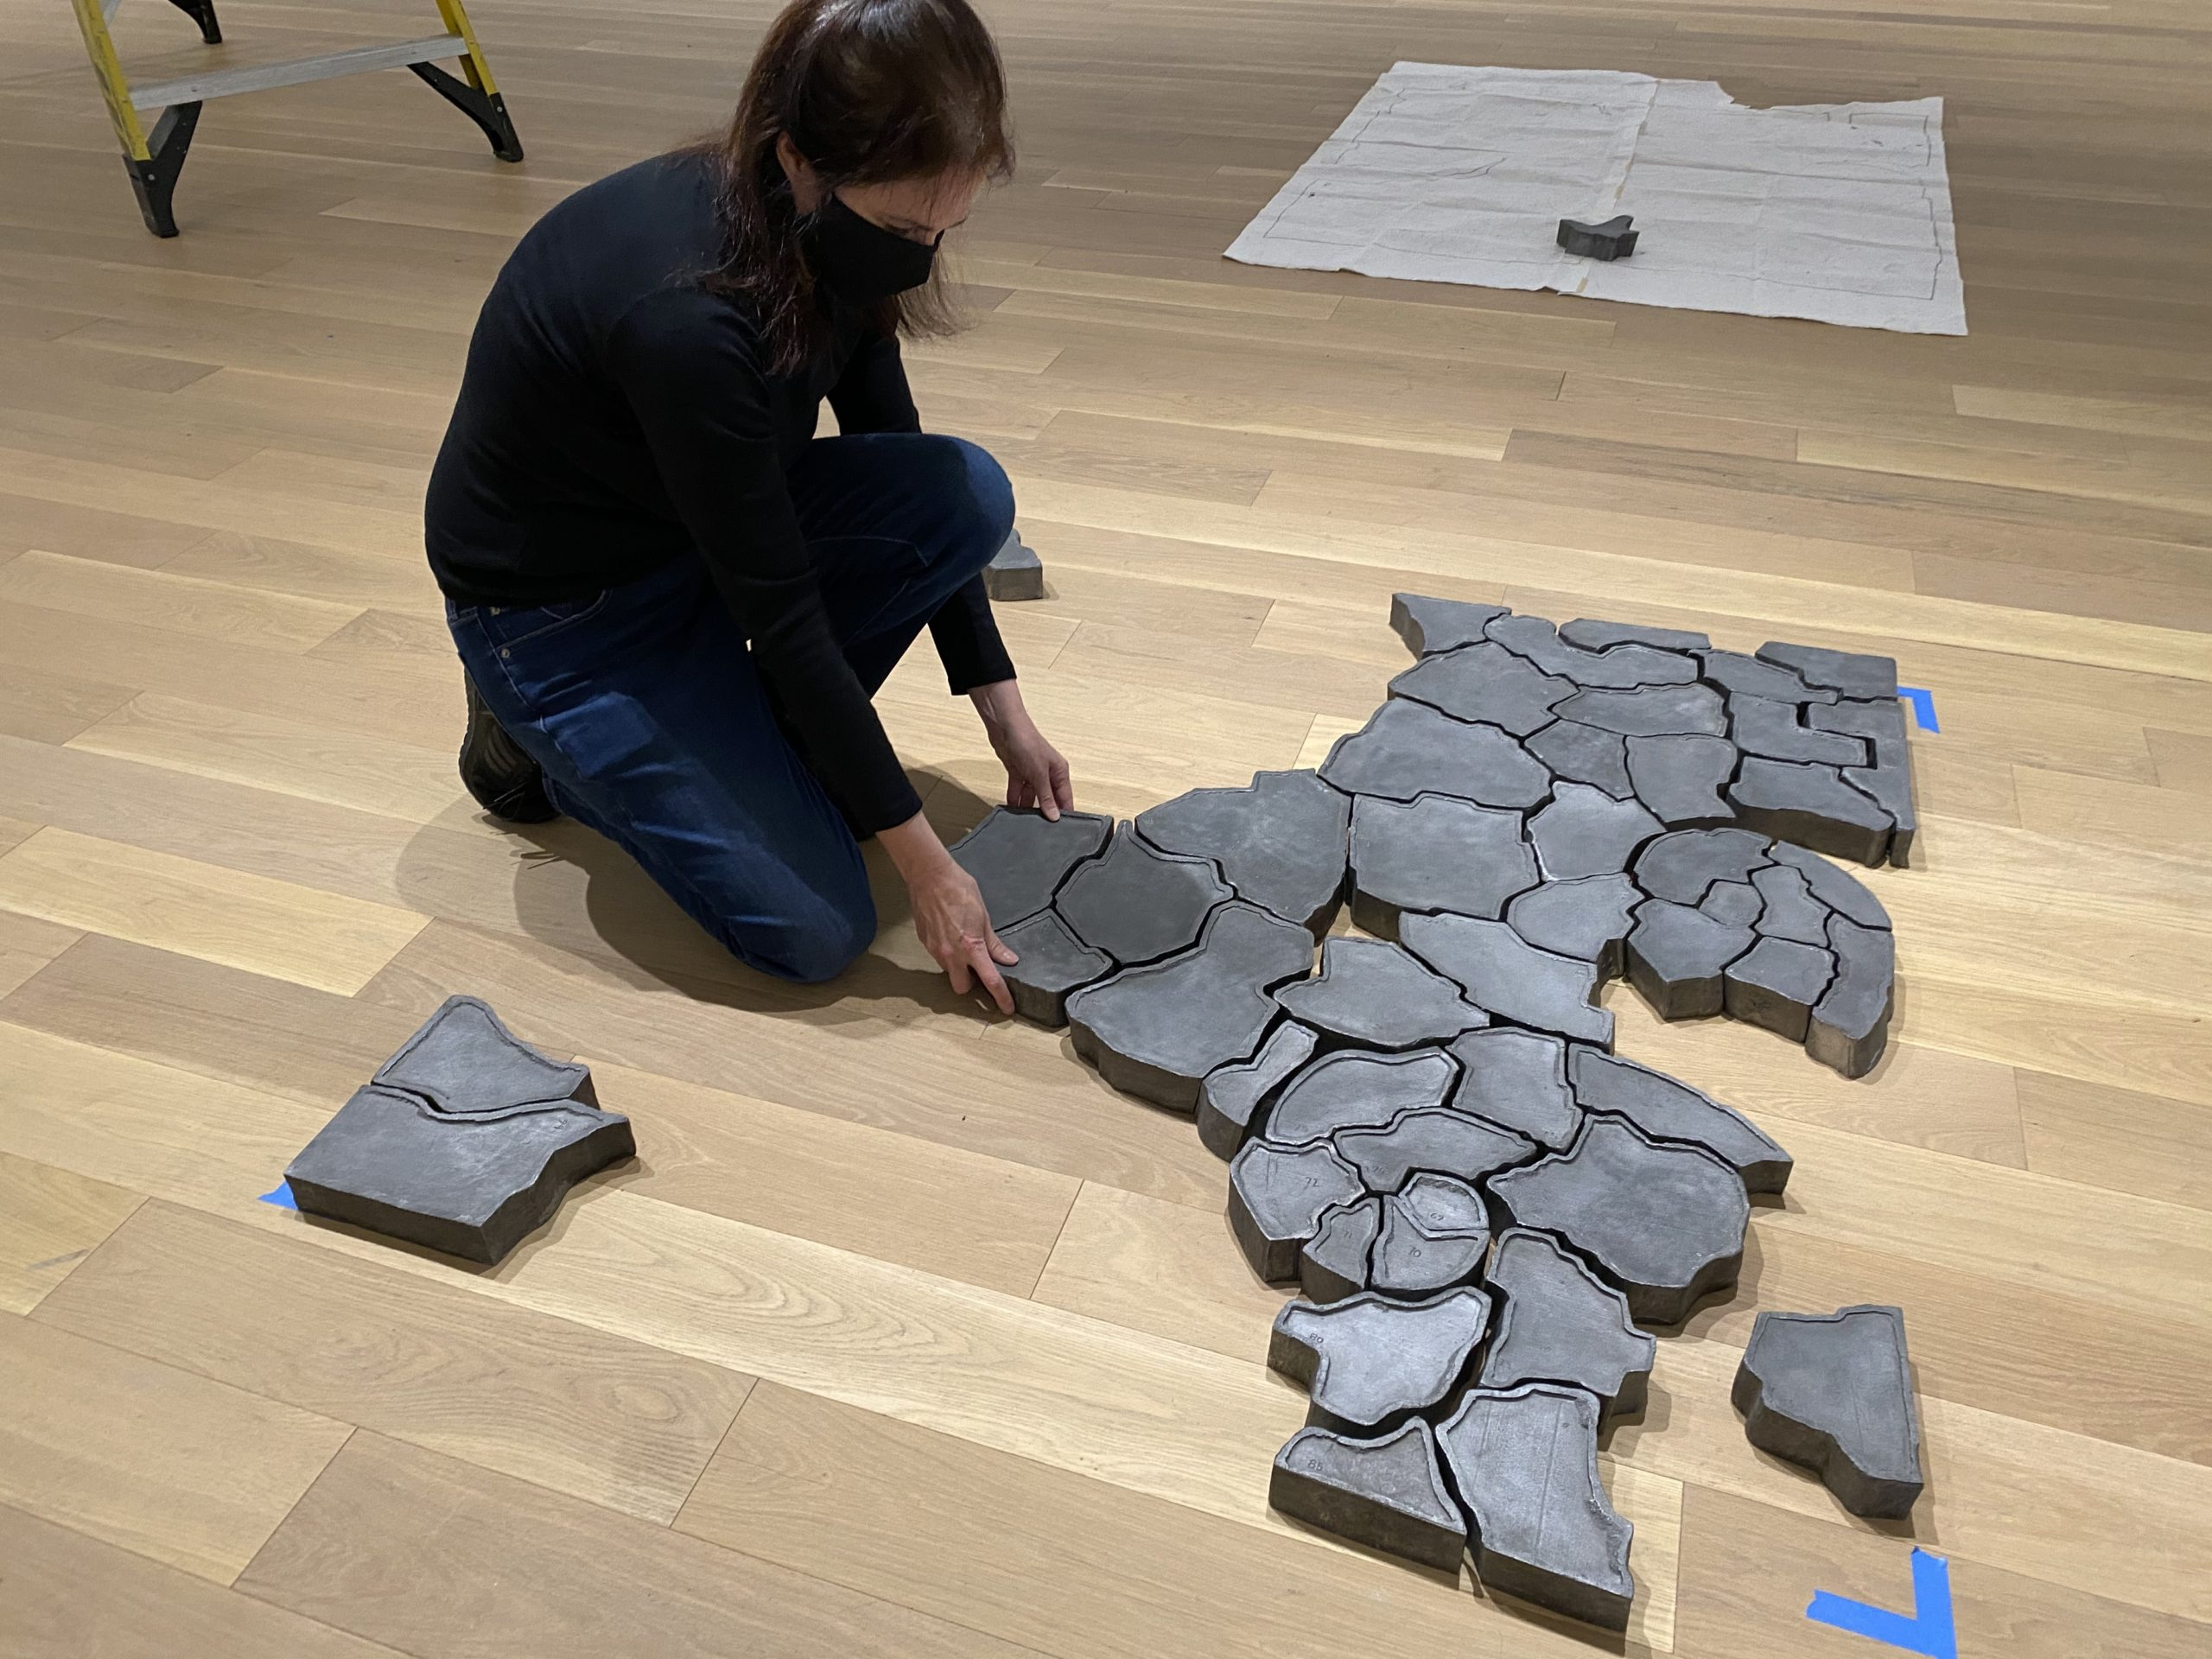 Karin Waisman installs